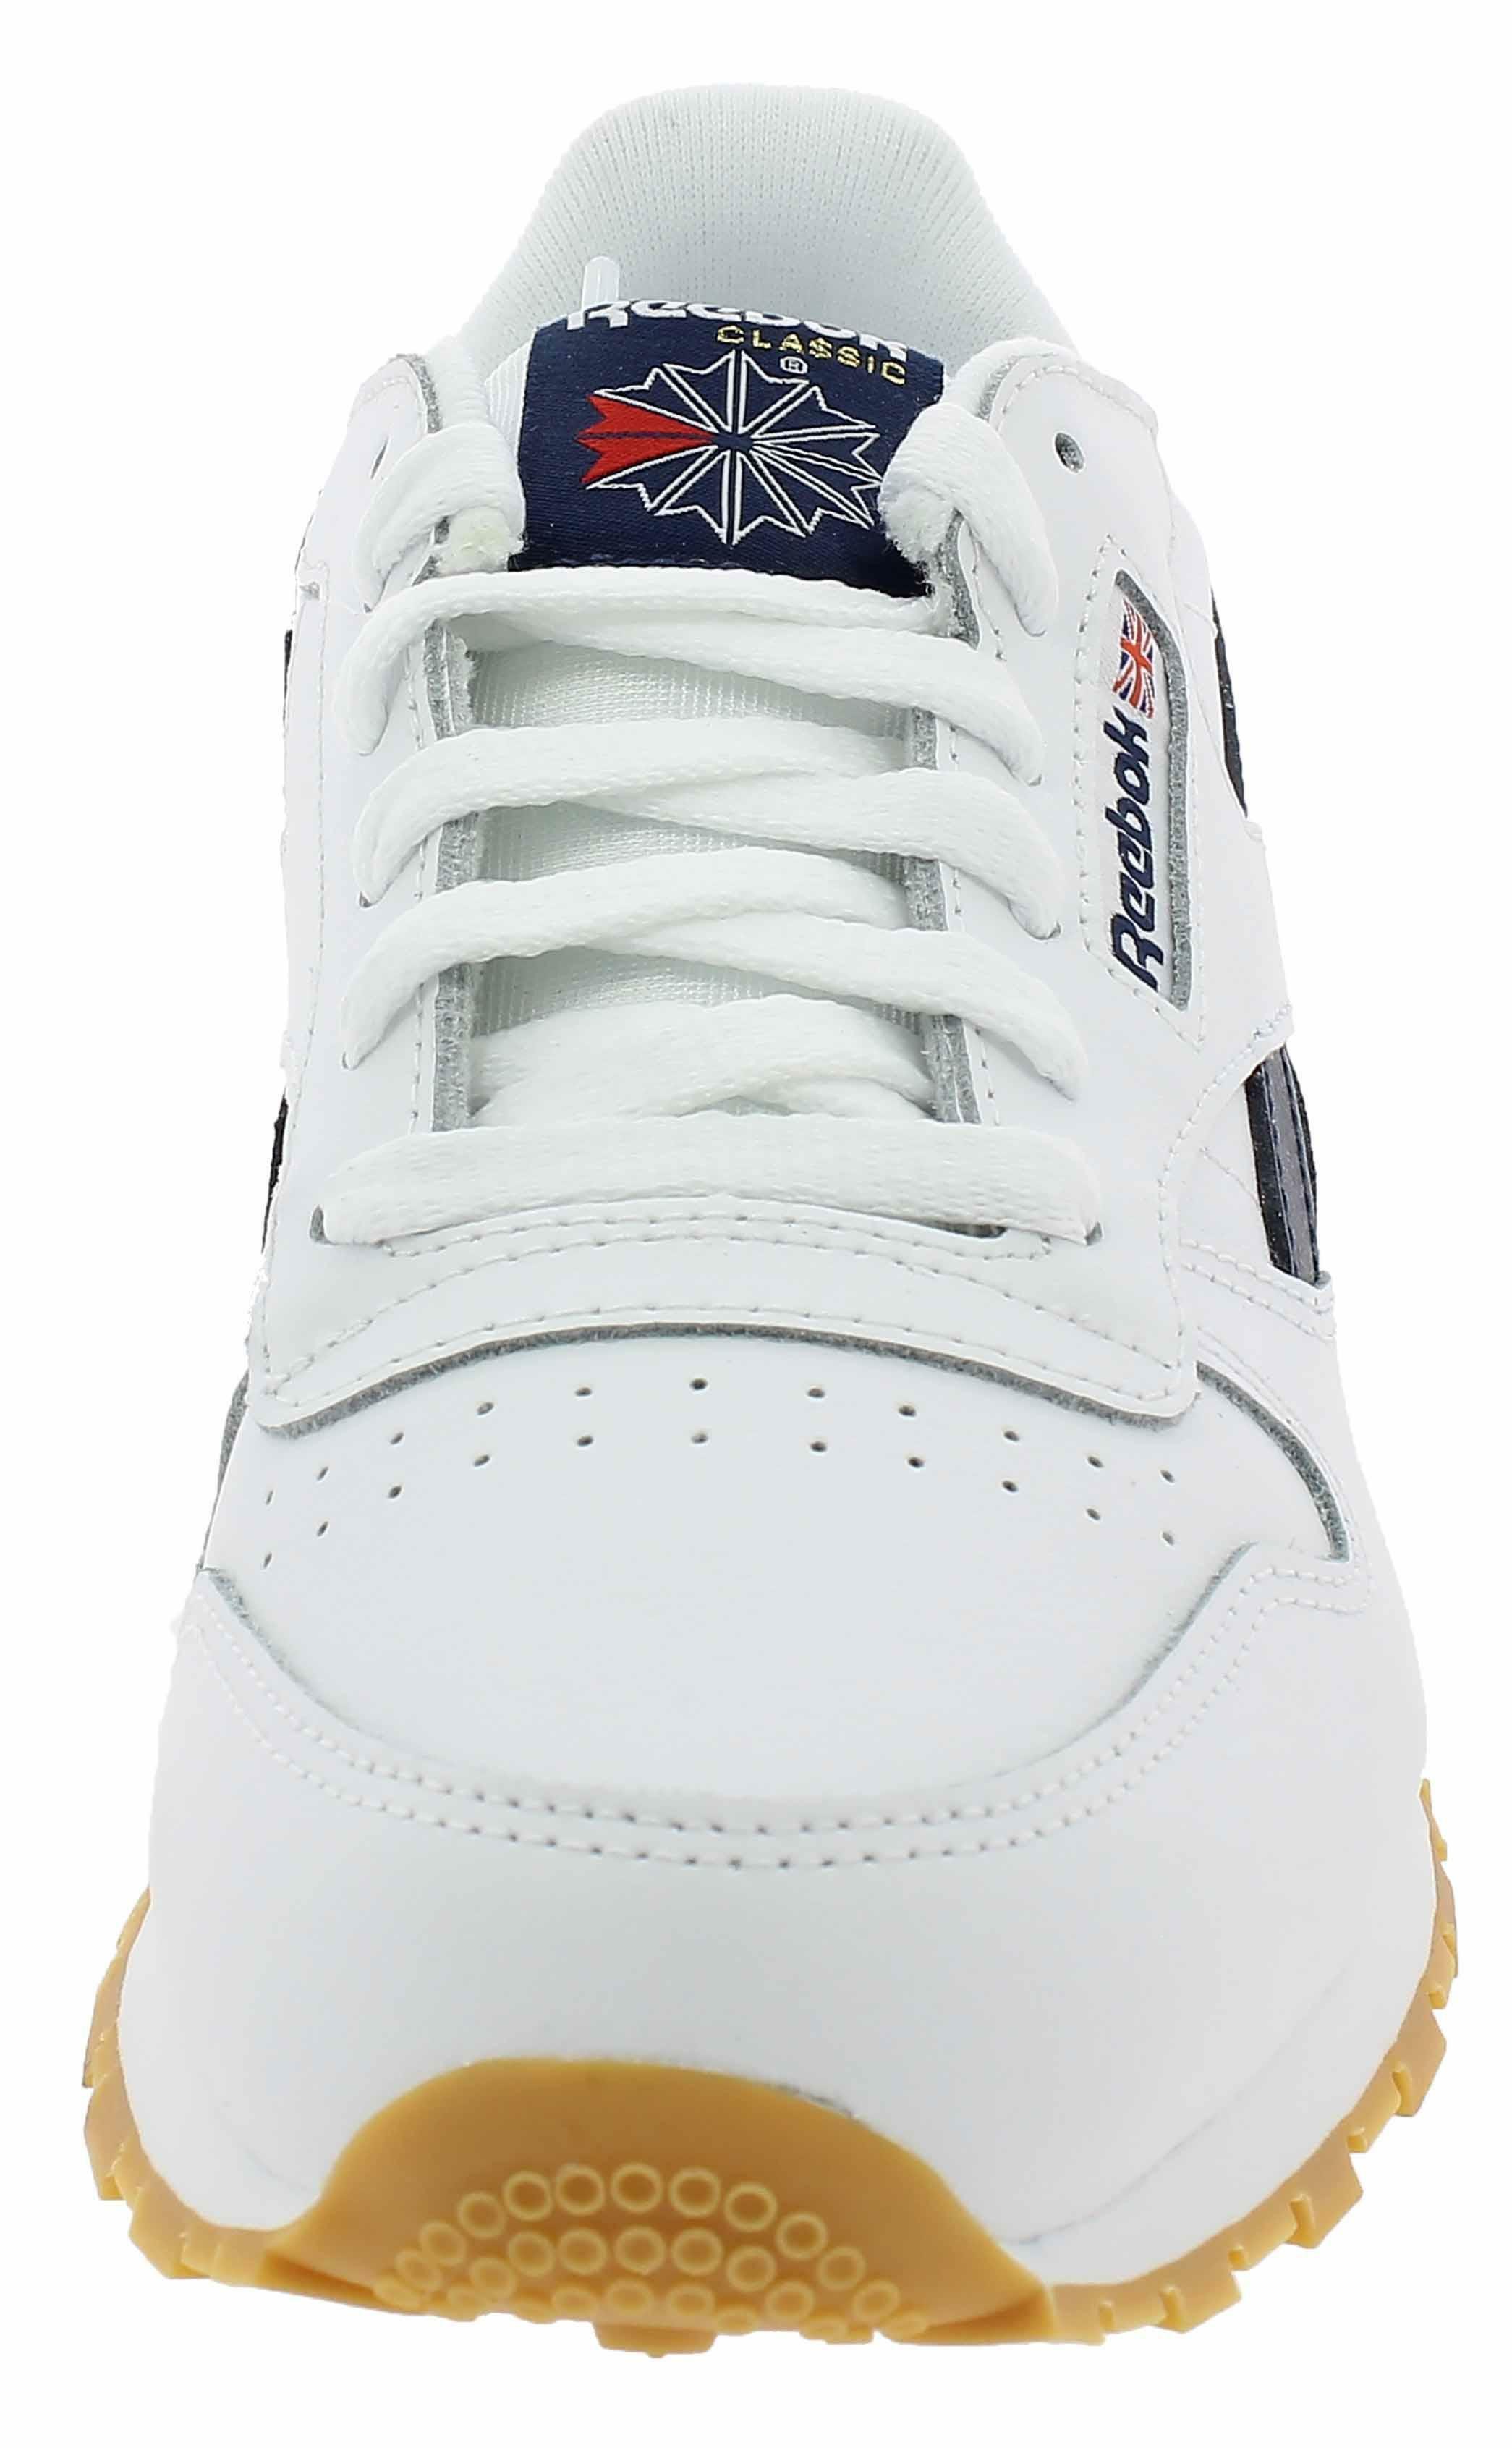 reebok classic leather scarpe sportive bambino bianche dv4567